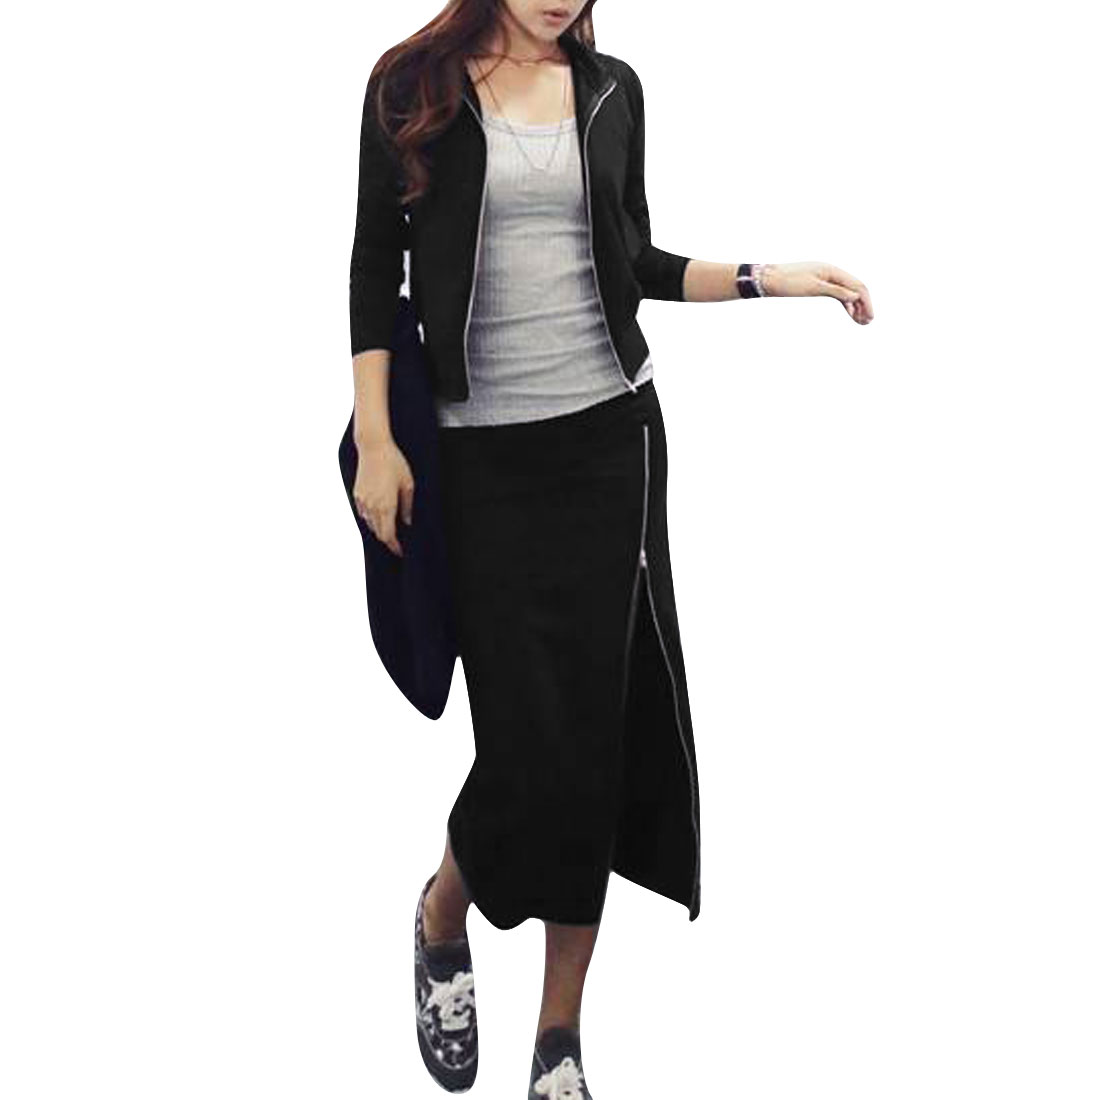 Lady Long Sleeve Zip Up Jacket & Stretchy Waist Black Skirt S